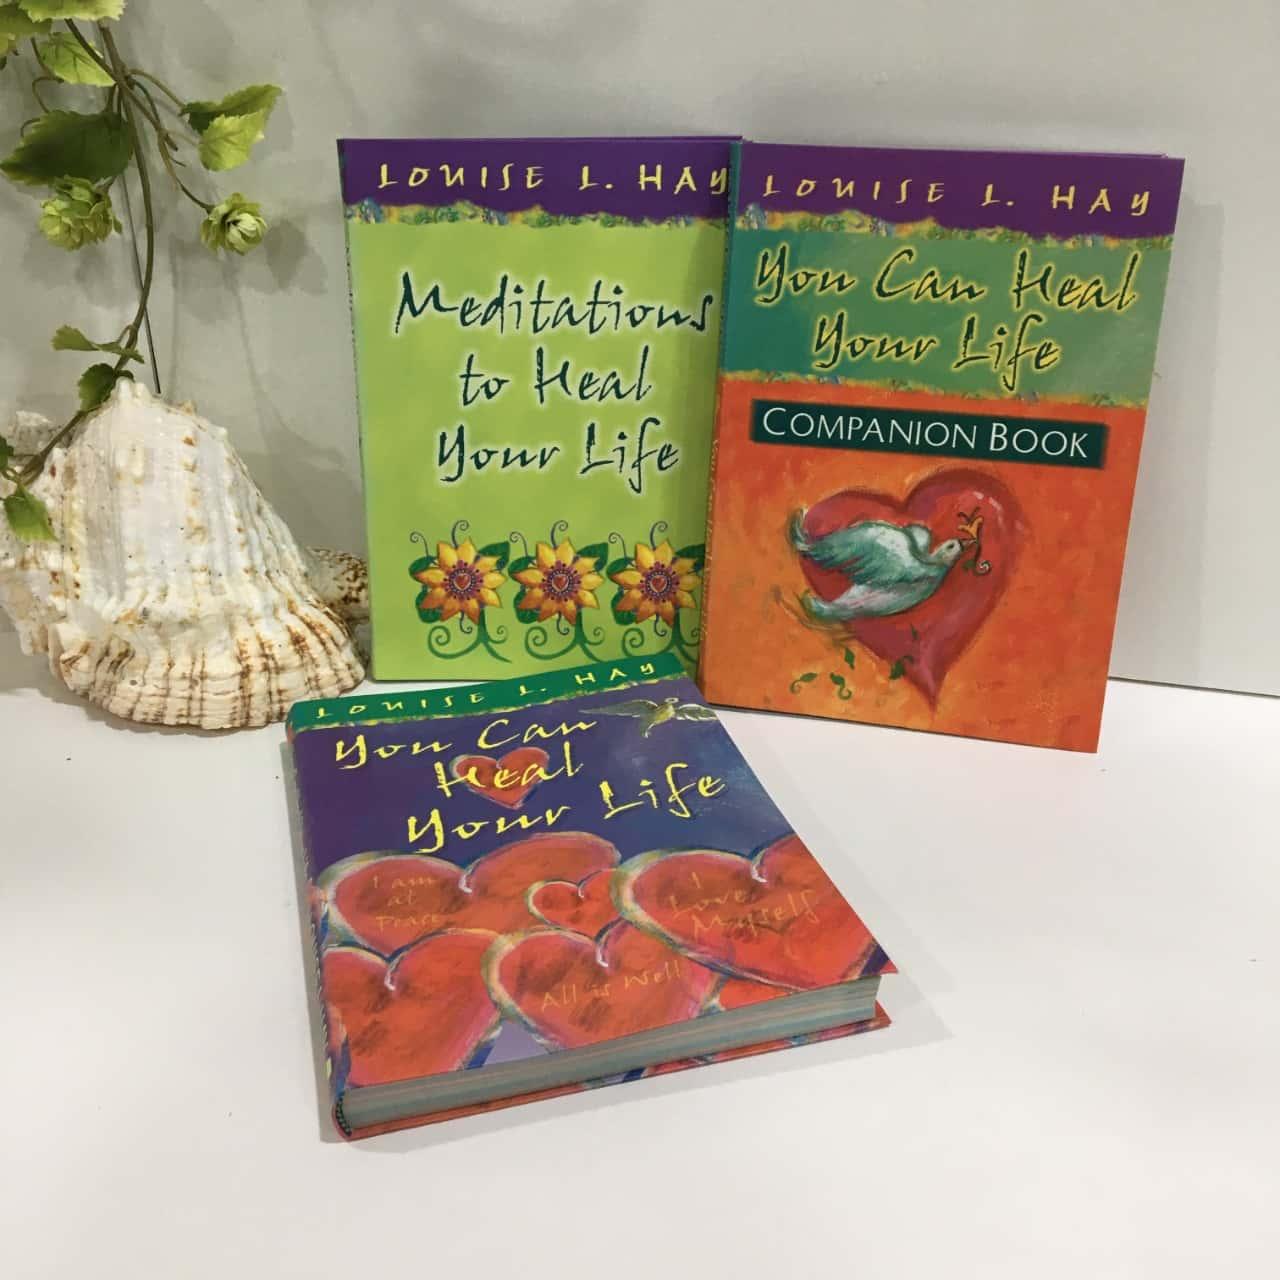 Louise. L. Hay, Book Bundle x 3 Books